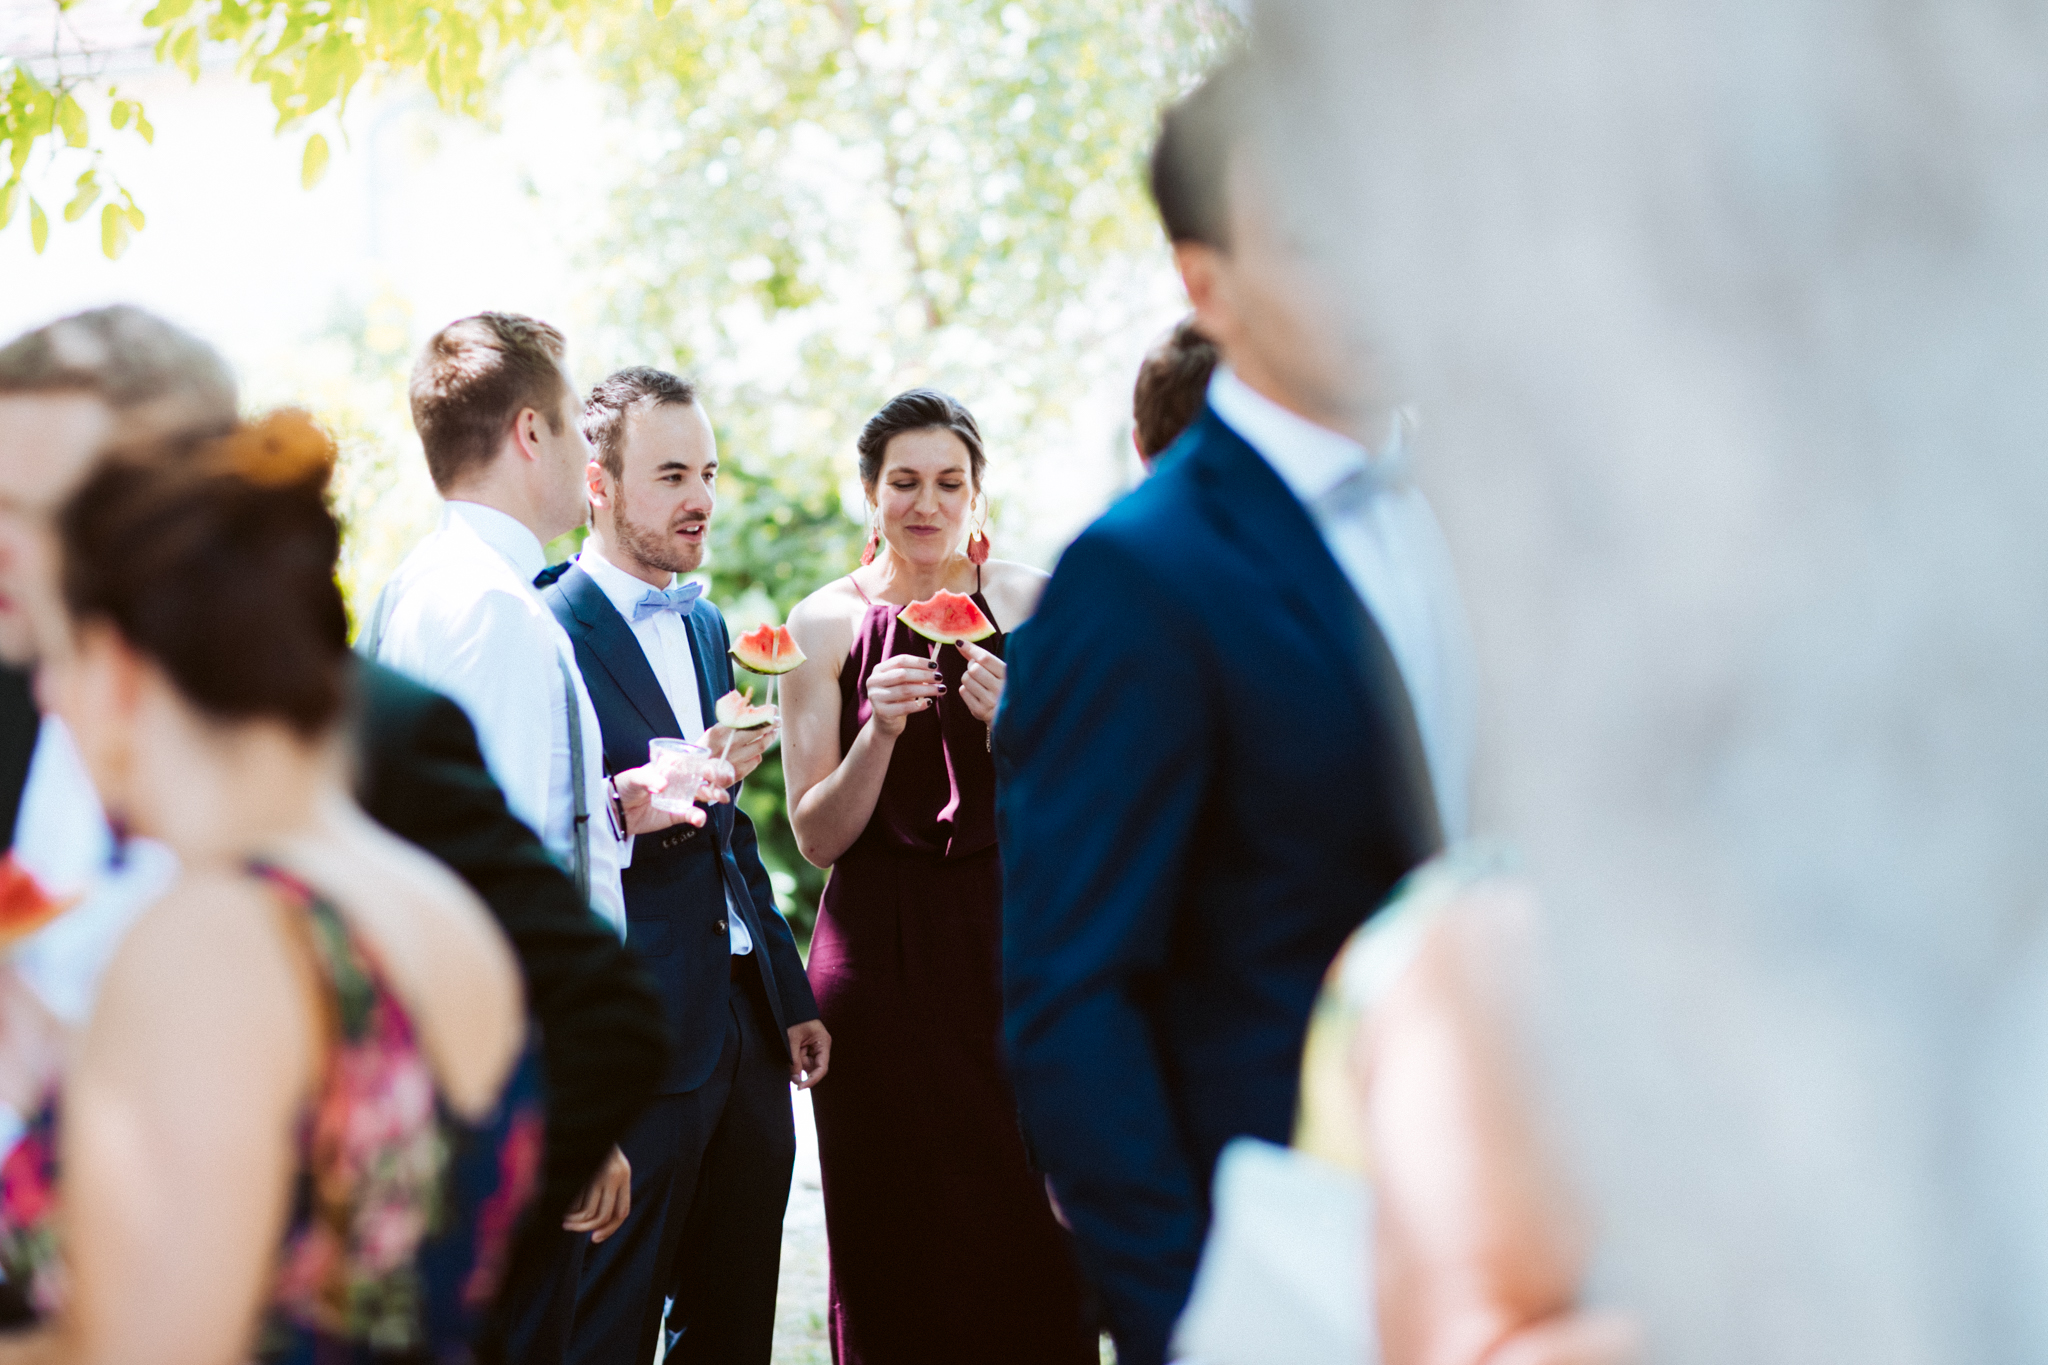 Marriage Champagne France - 064.jpg